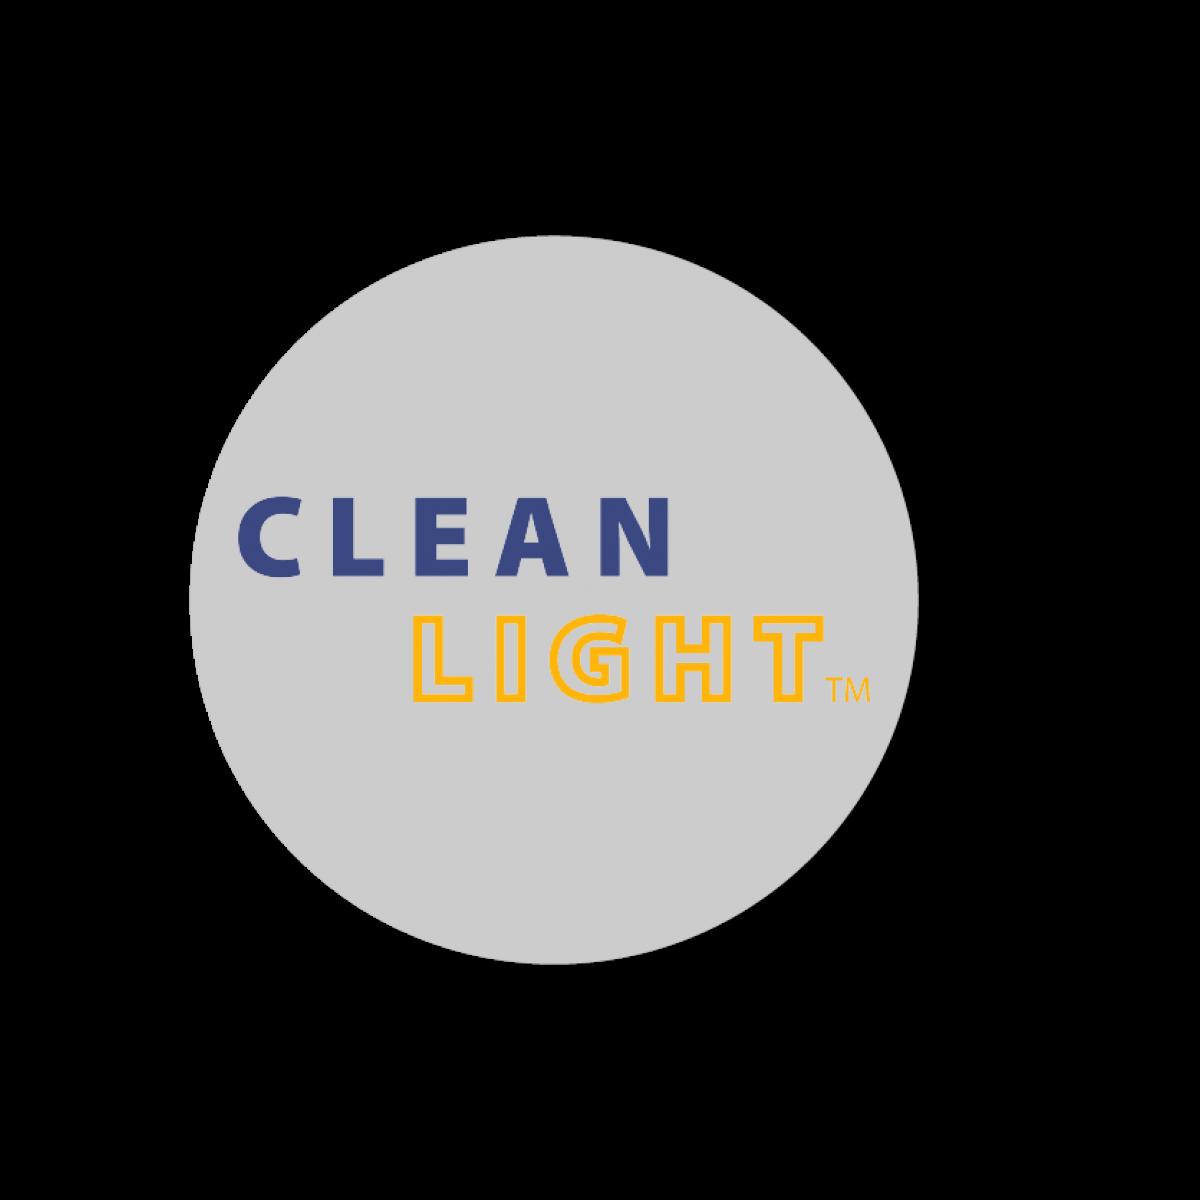 clean light icono jmv-13